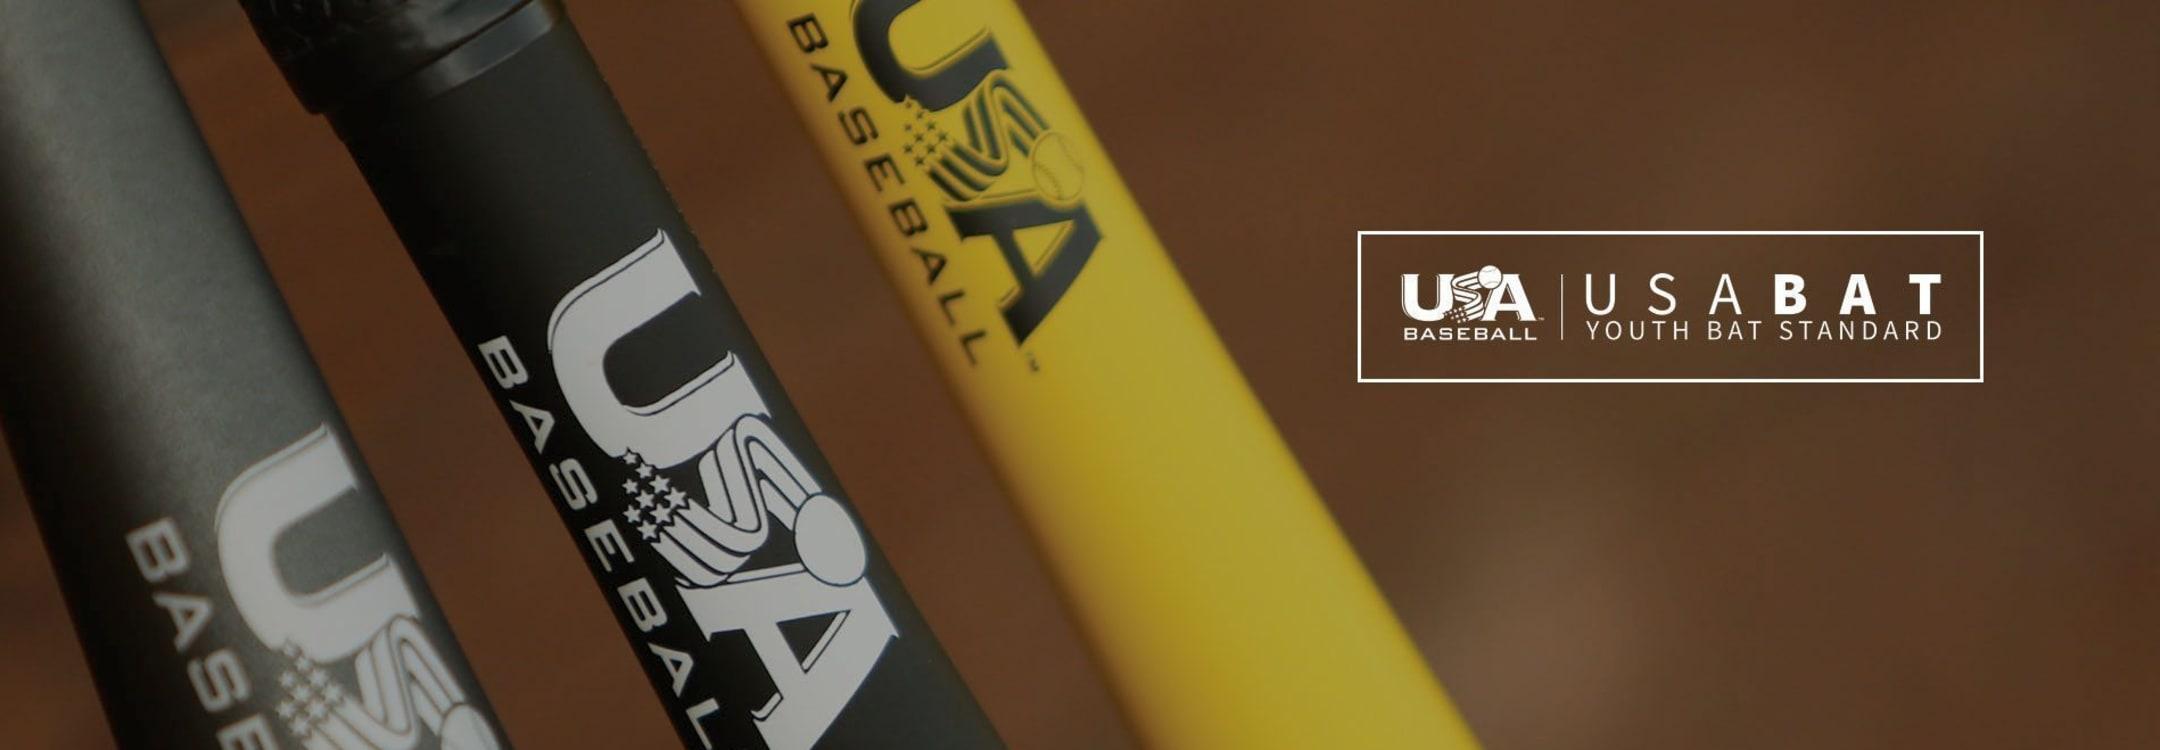 bat with usabat sticker